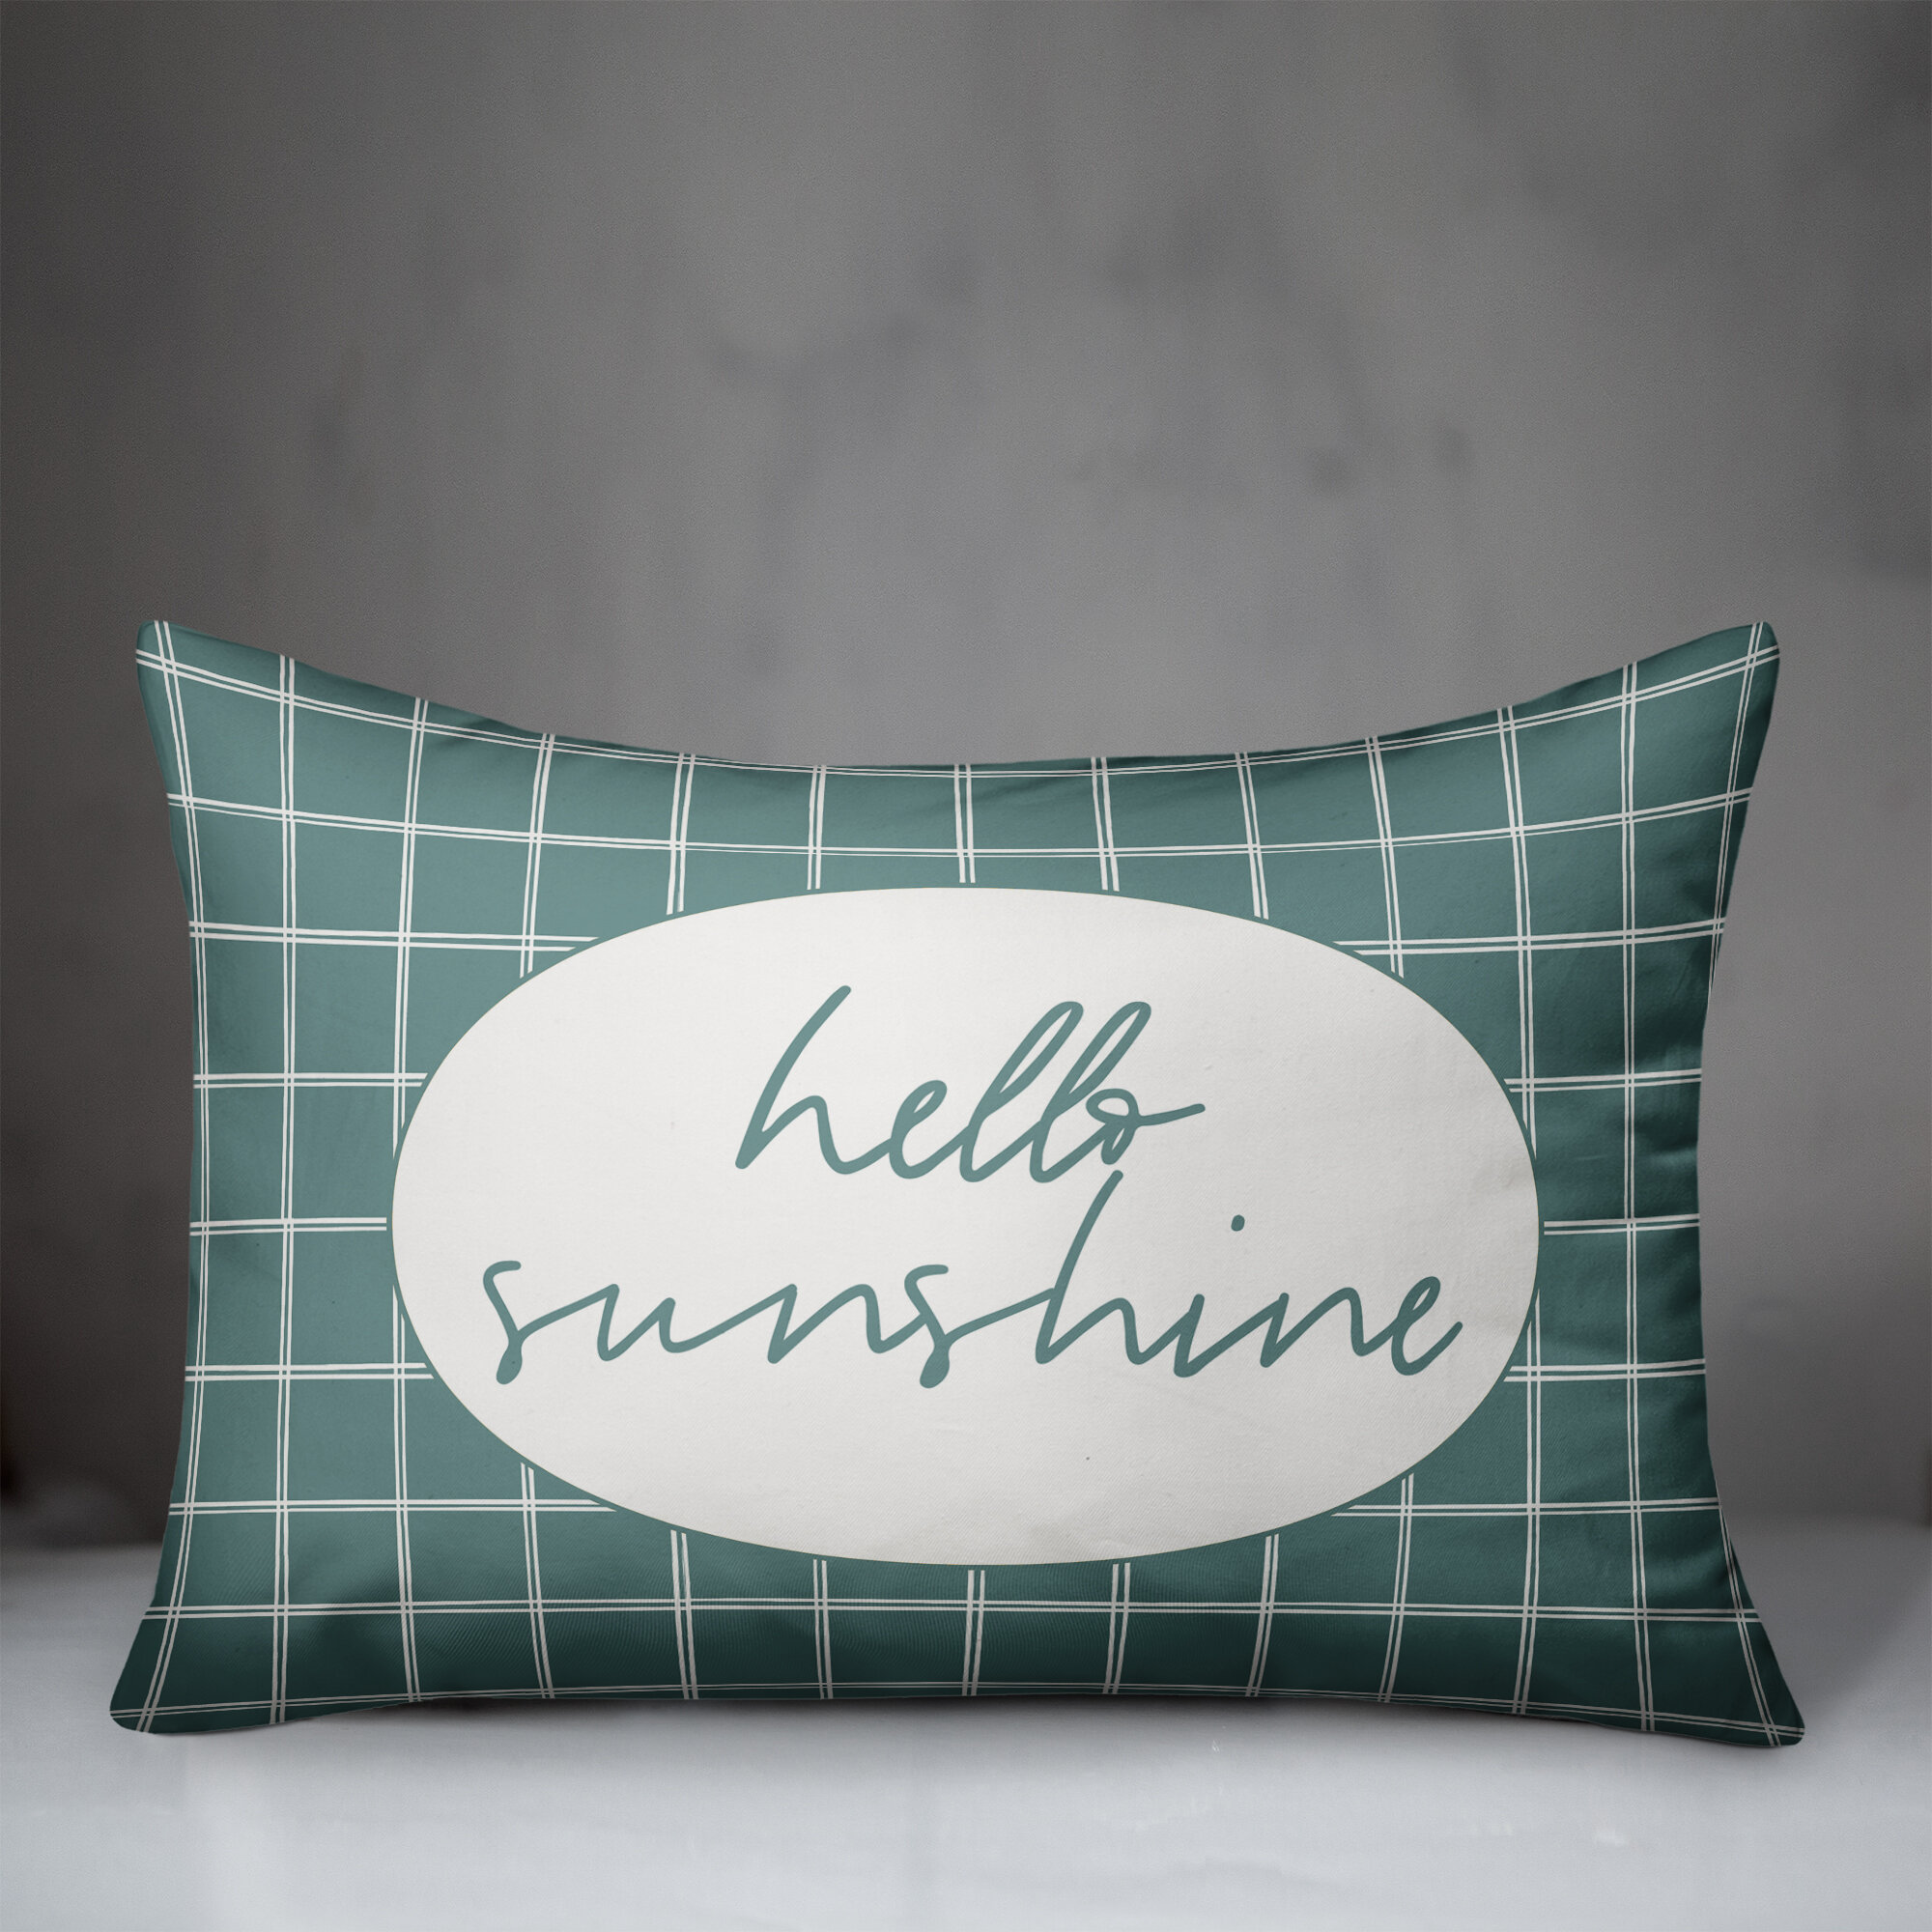 Modern Farmhouse Teal Outdoor Pillows You Ll Love In 2021 Wayfair